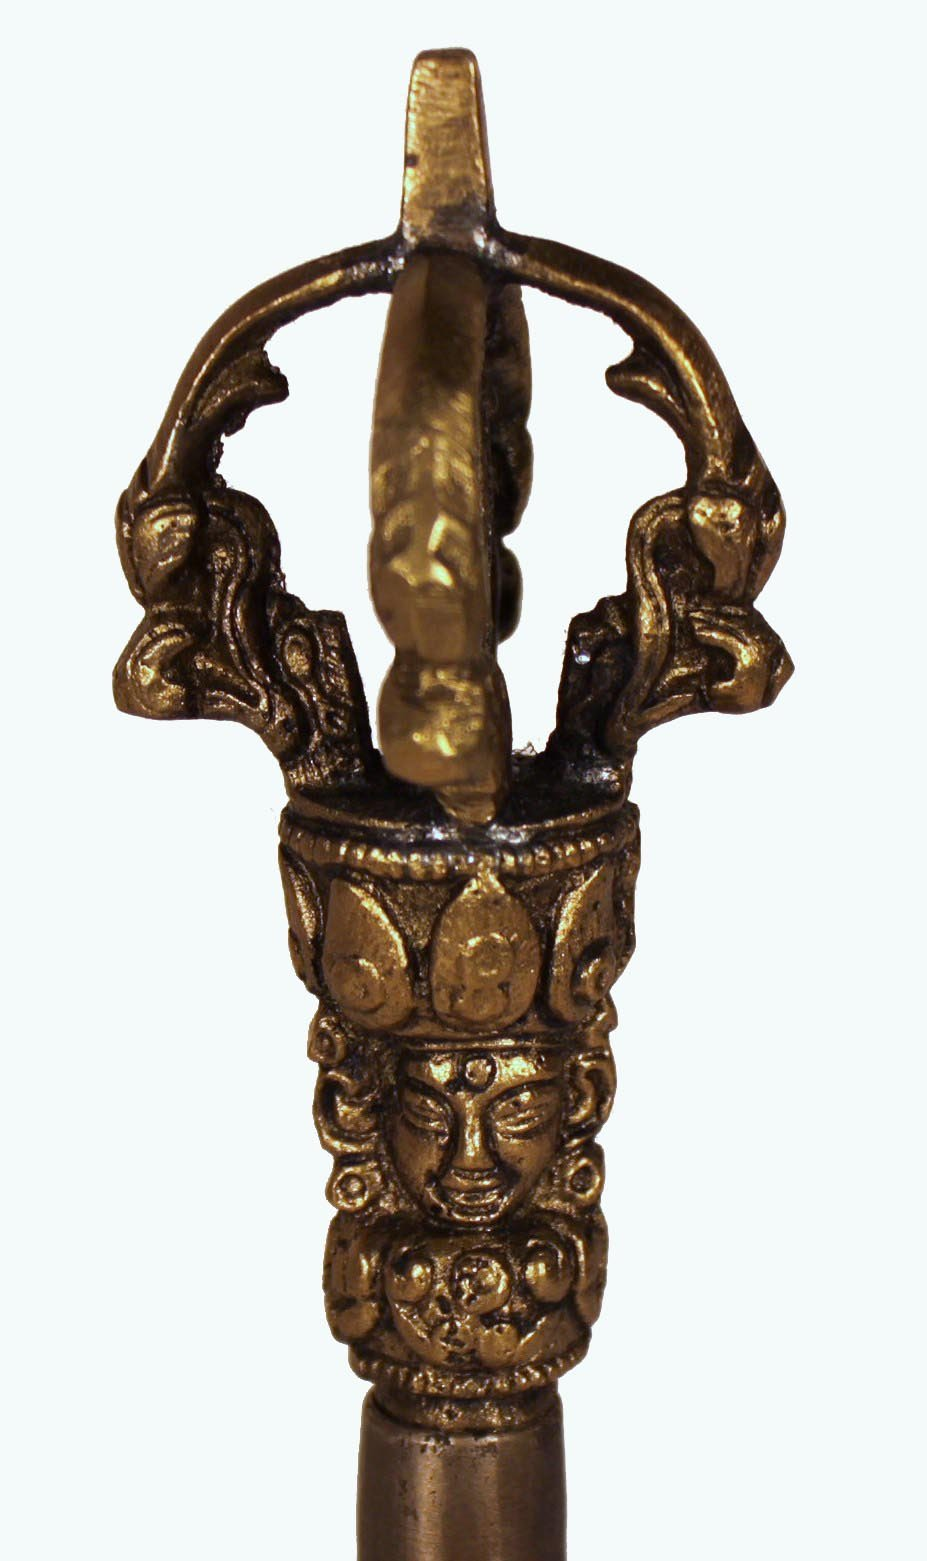 Antique Bell / Tibetan Meditation Bell / Tibetan / Multi-Layered Harmonics / Meditation Tool by Tibetan (Image #2)